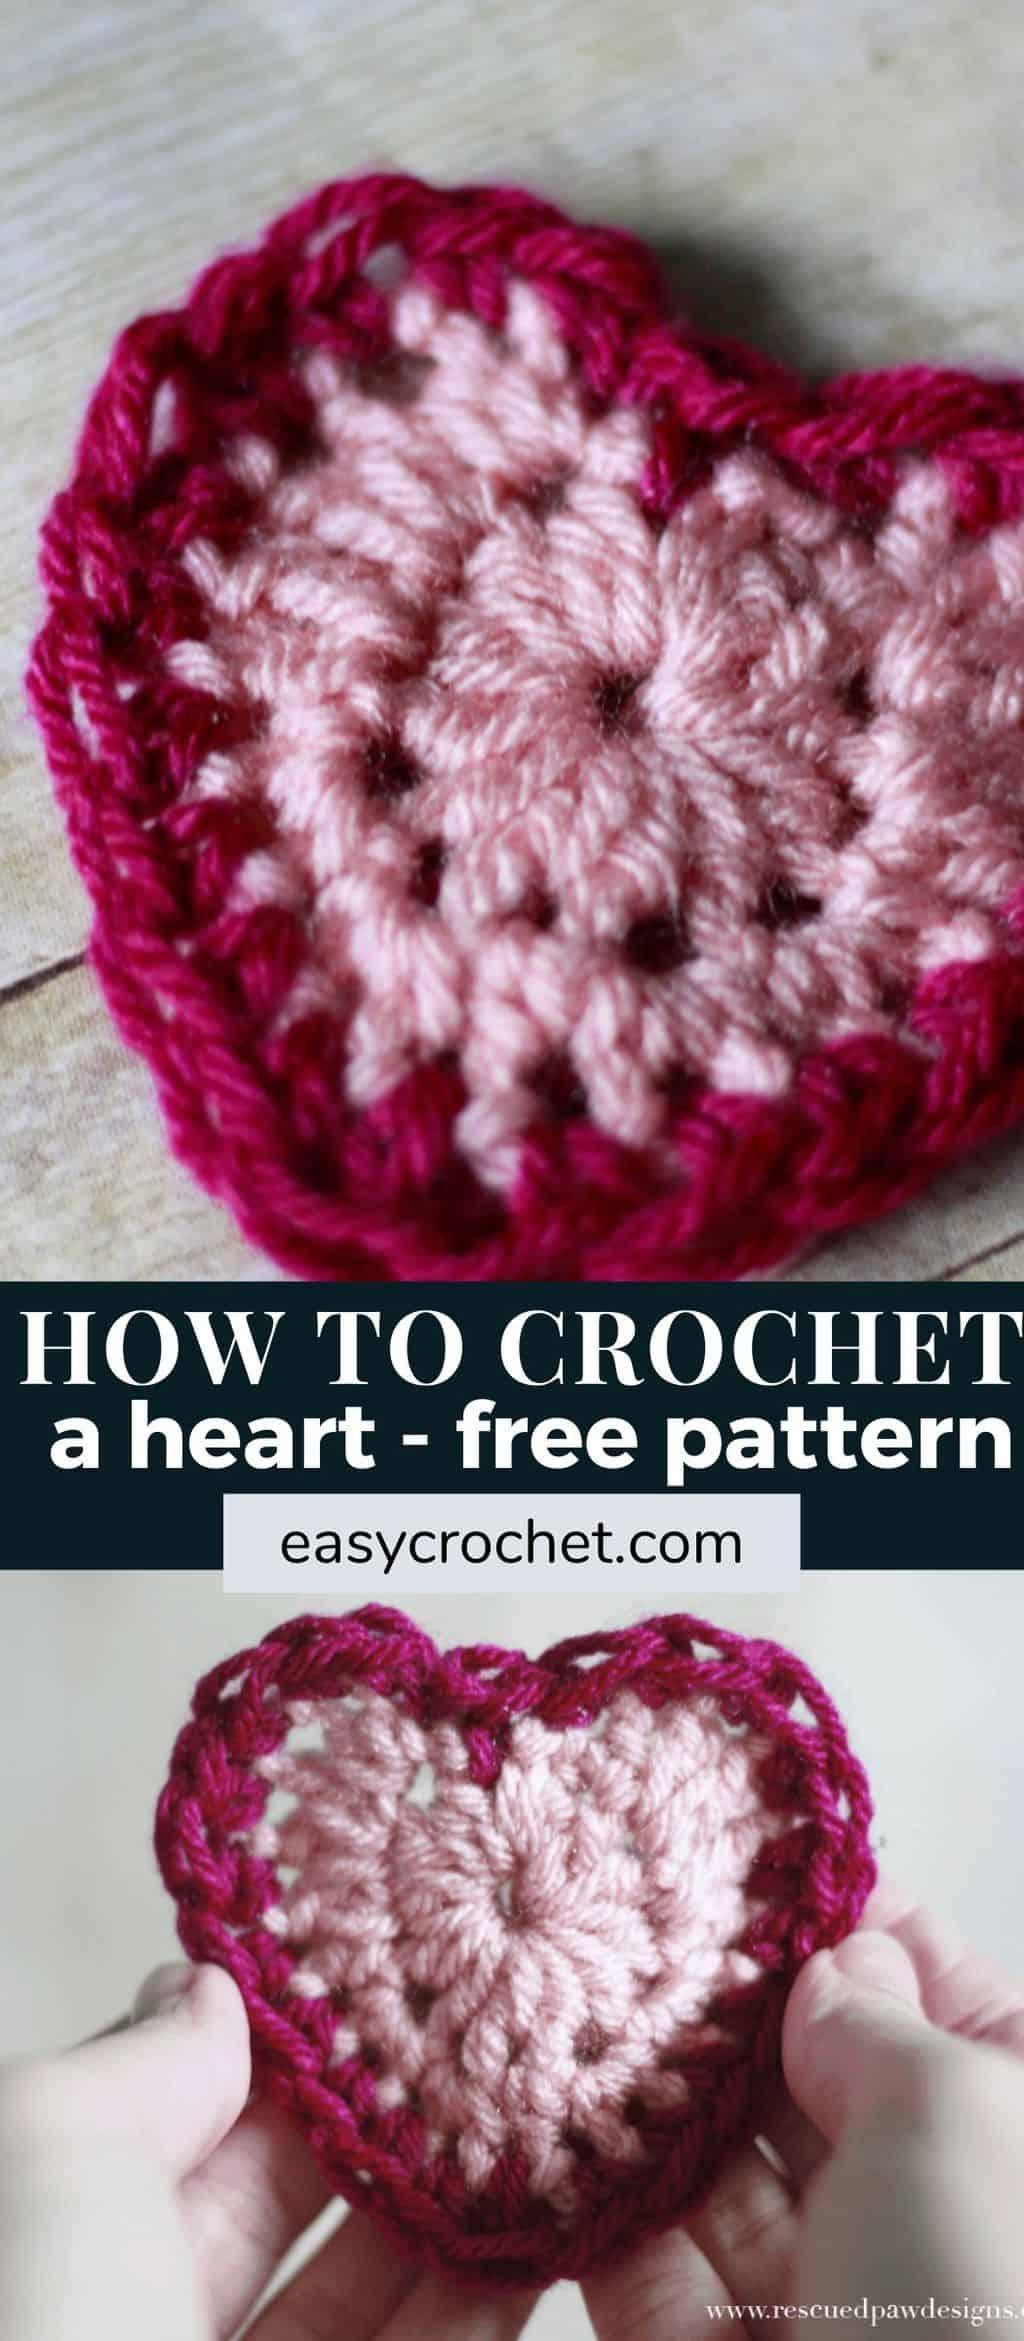 learn how to crochet a heart via @easycrochetcom